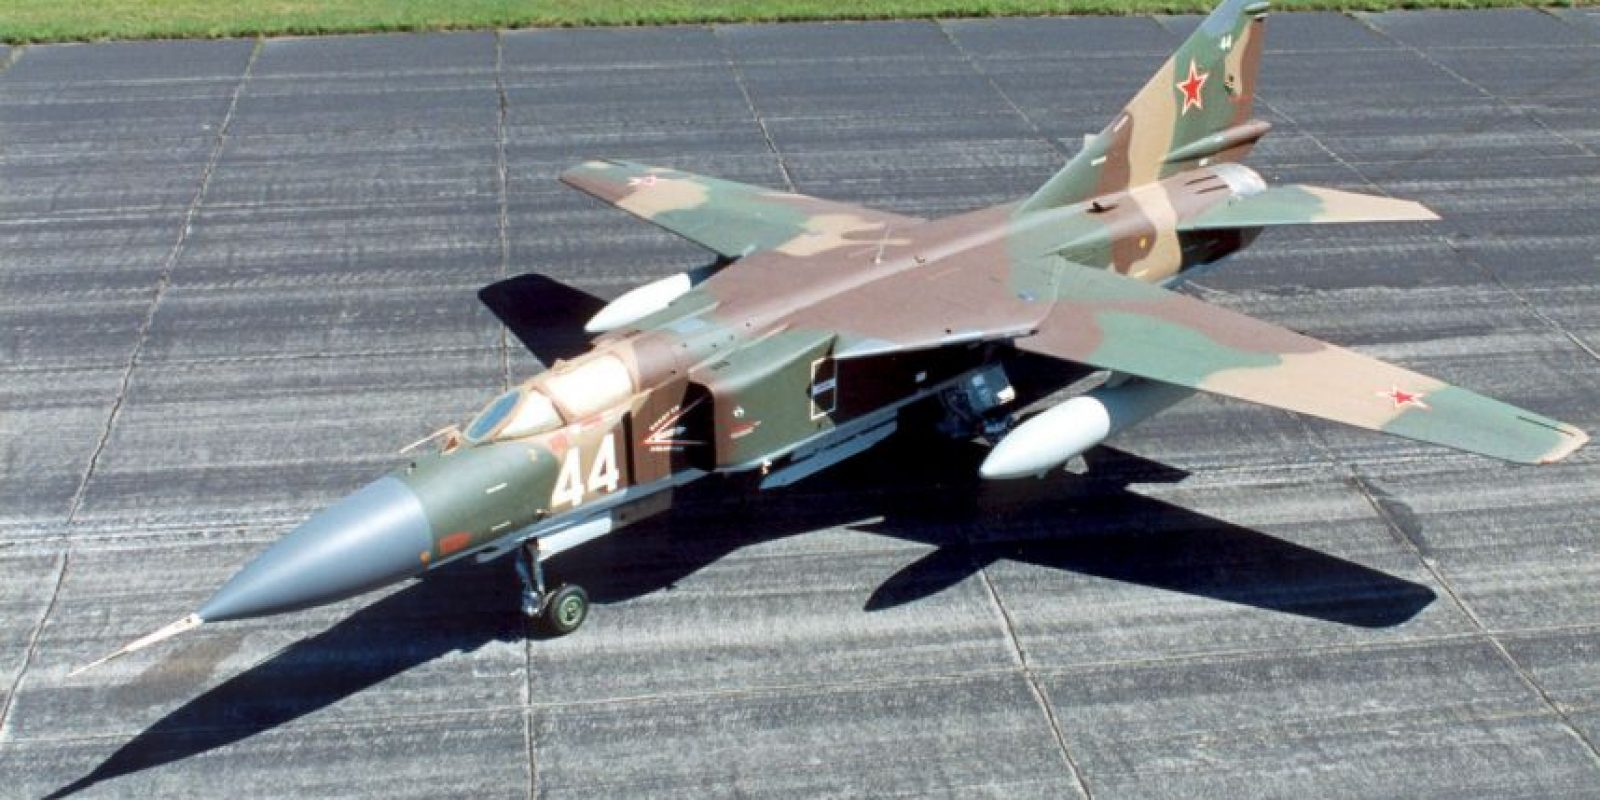 6. MiG-23 Flogger. Velocidad máxima de Mach 2,35 (2.878,9 km/h) Foto:Wikimedia